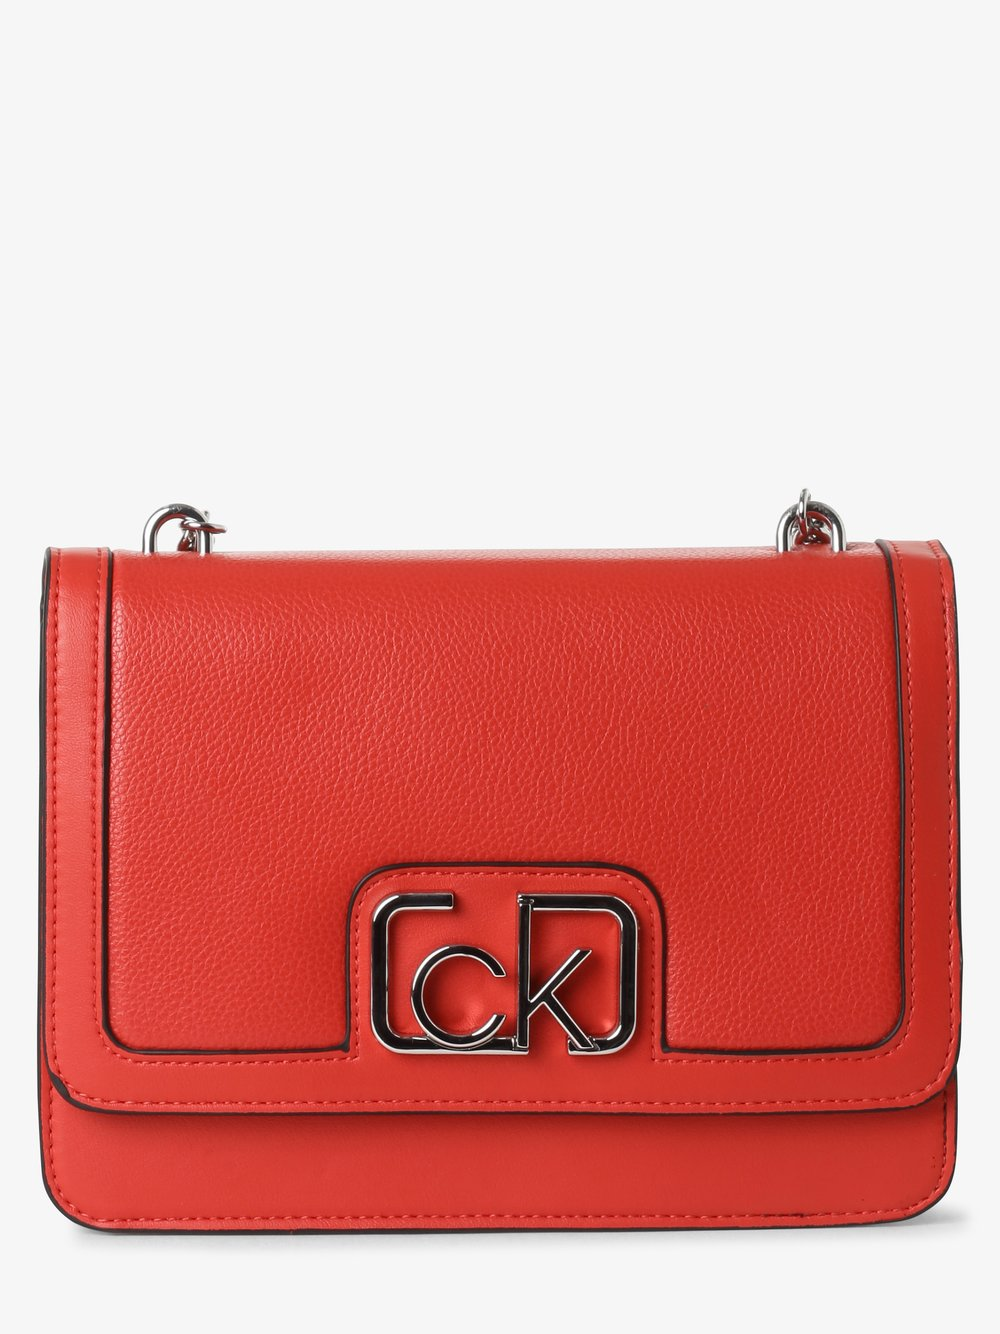 Calvin Klein - Damska torebka na ramię, czerwony